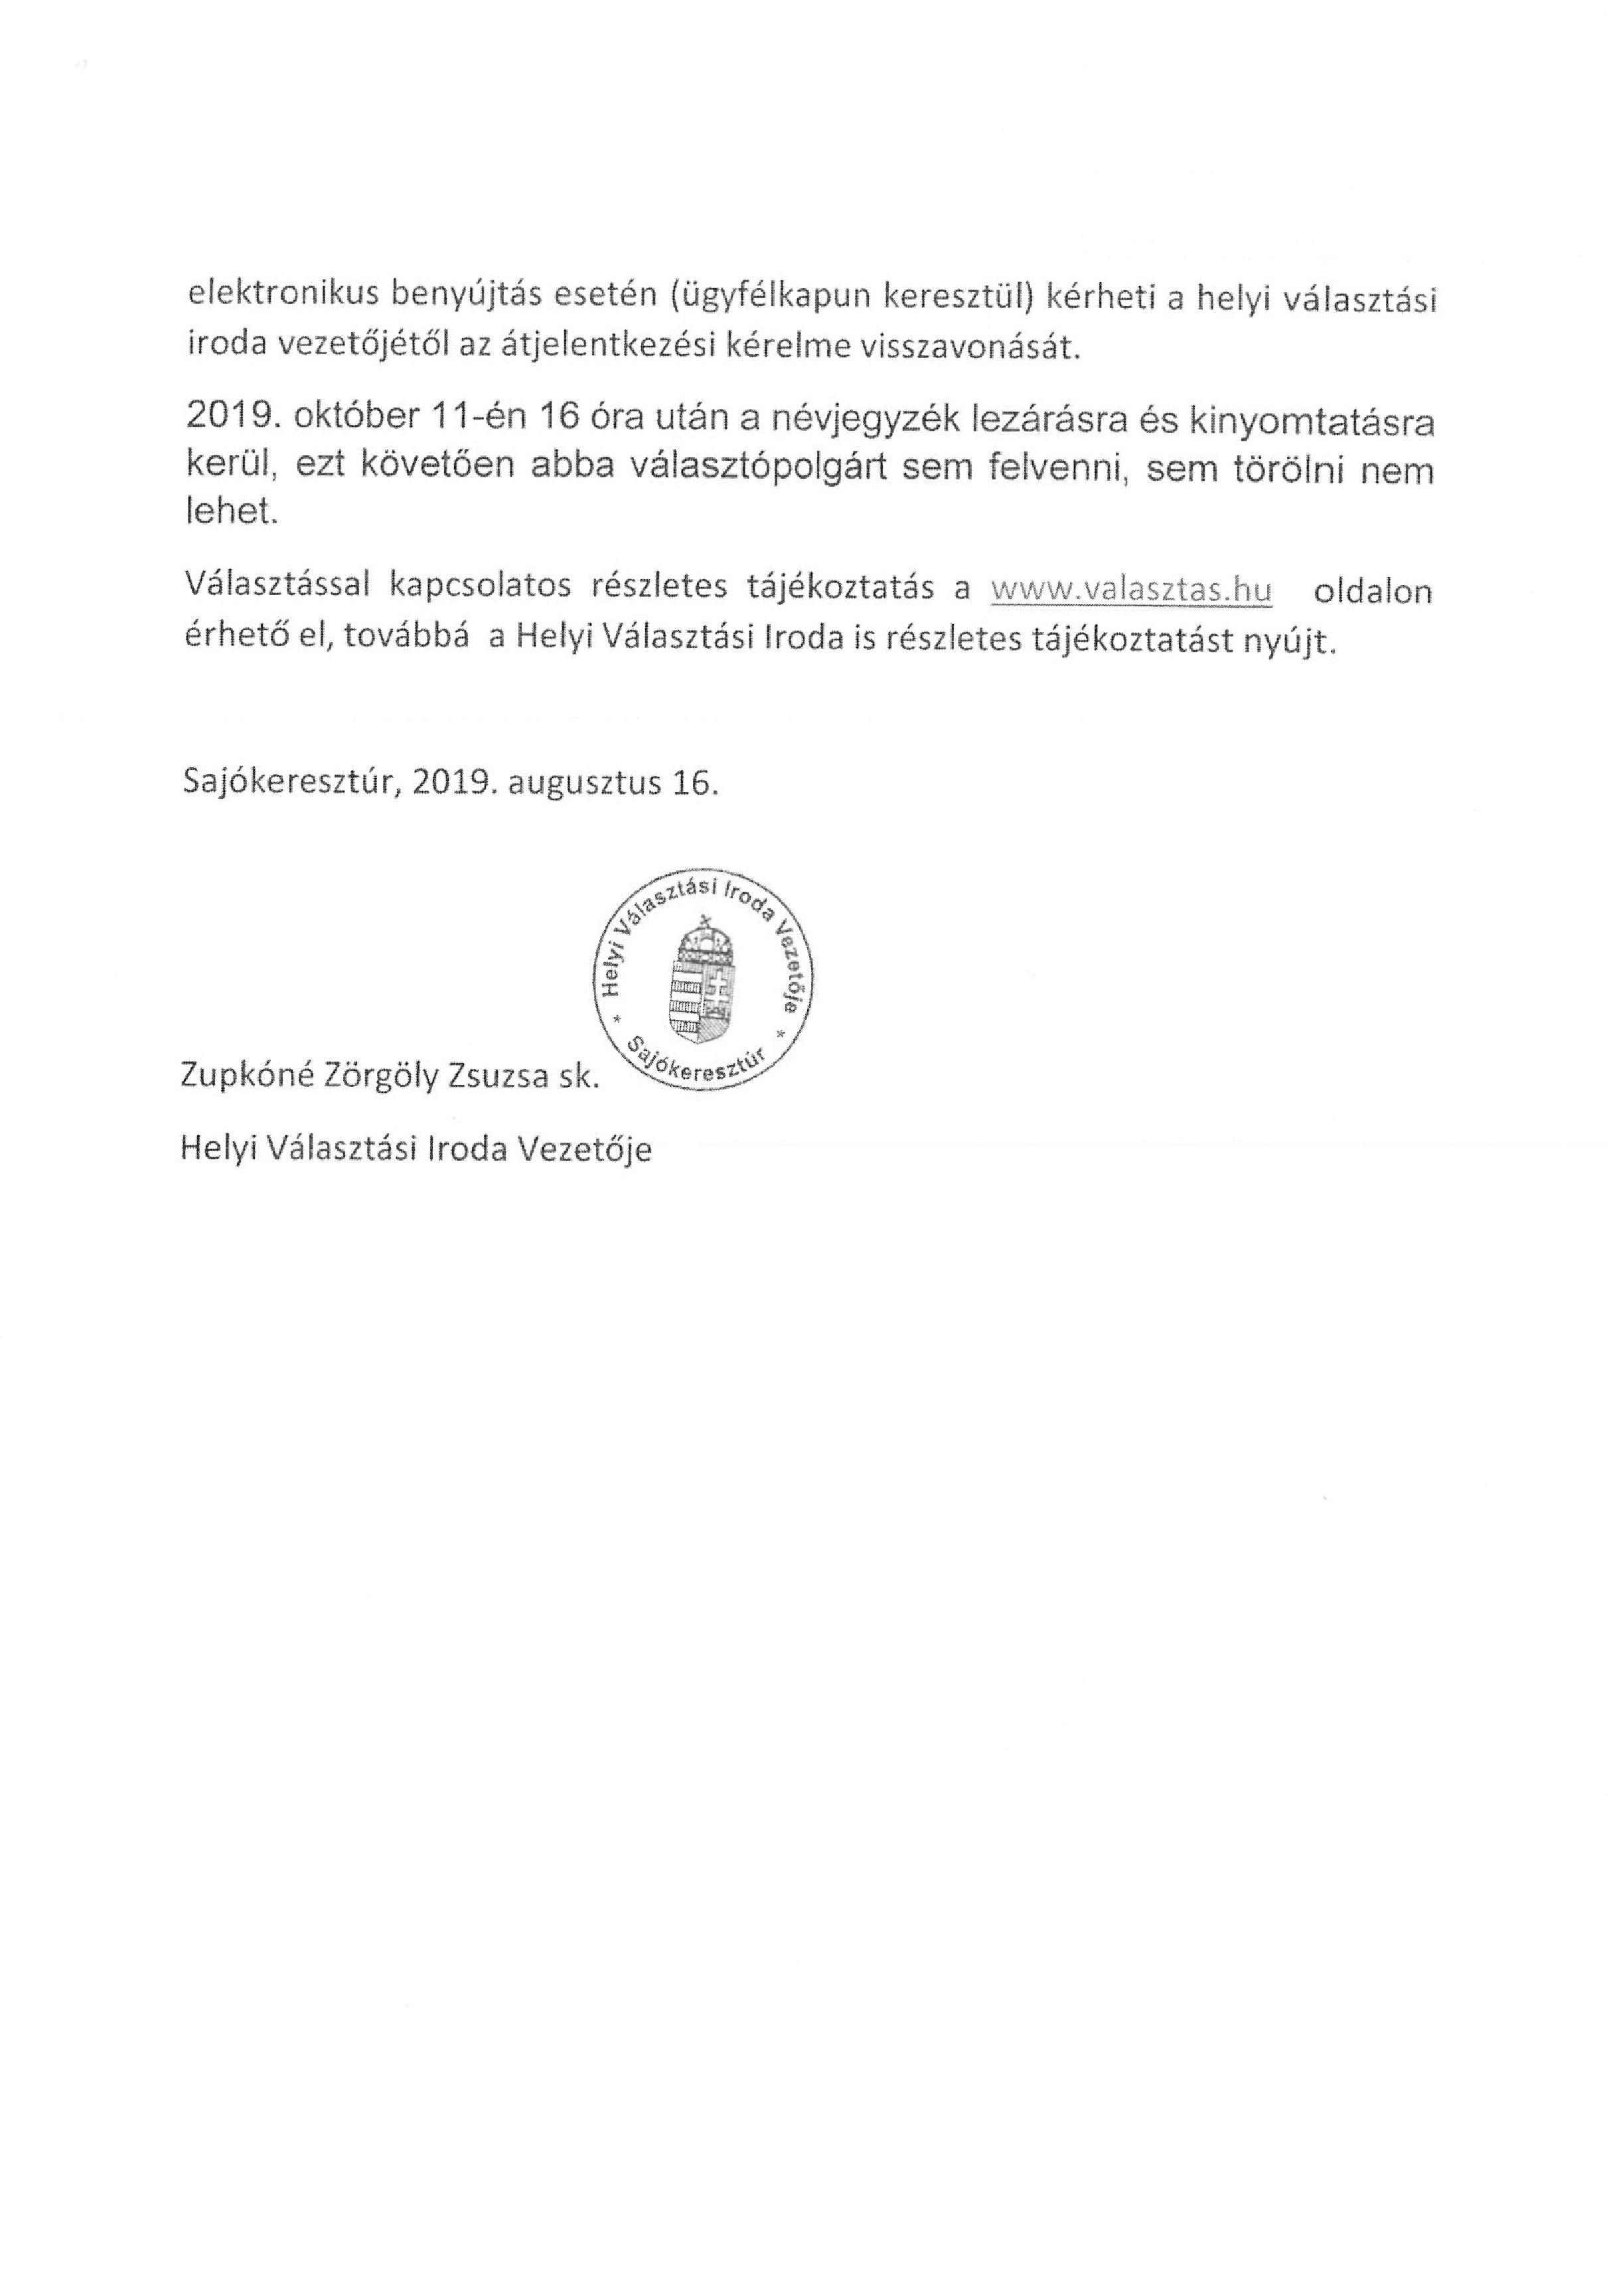 helyi_valasztasi_iroda_kozlemeny-page-004.jpg